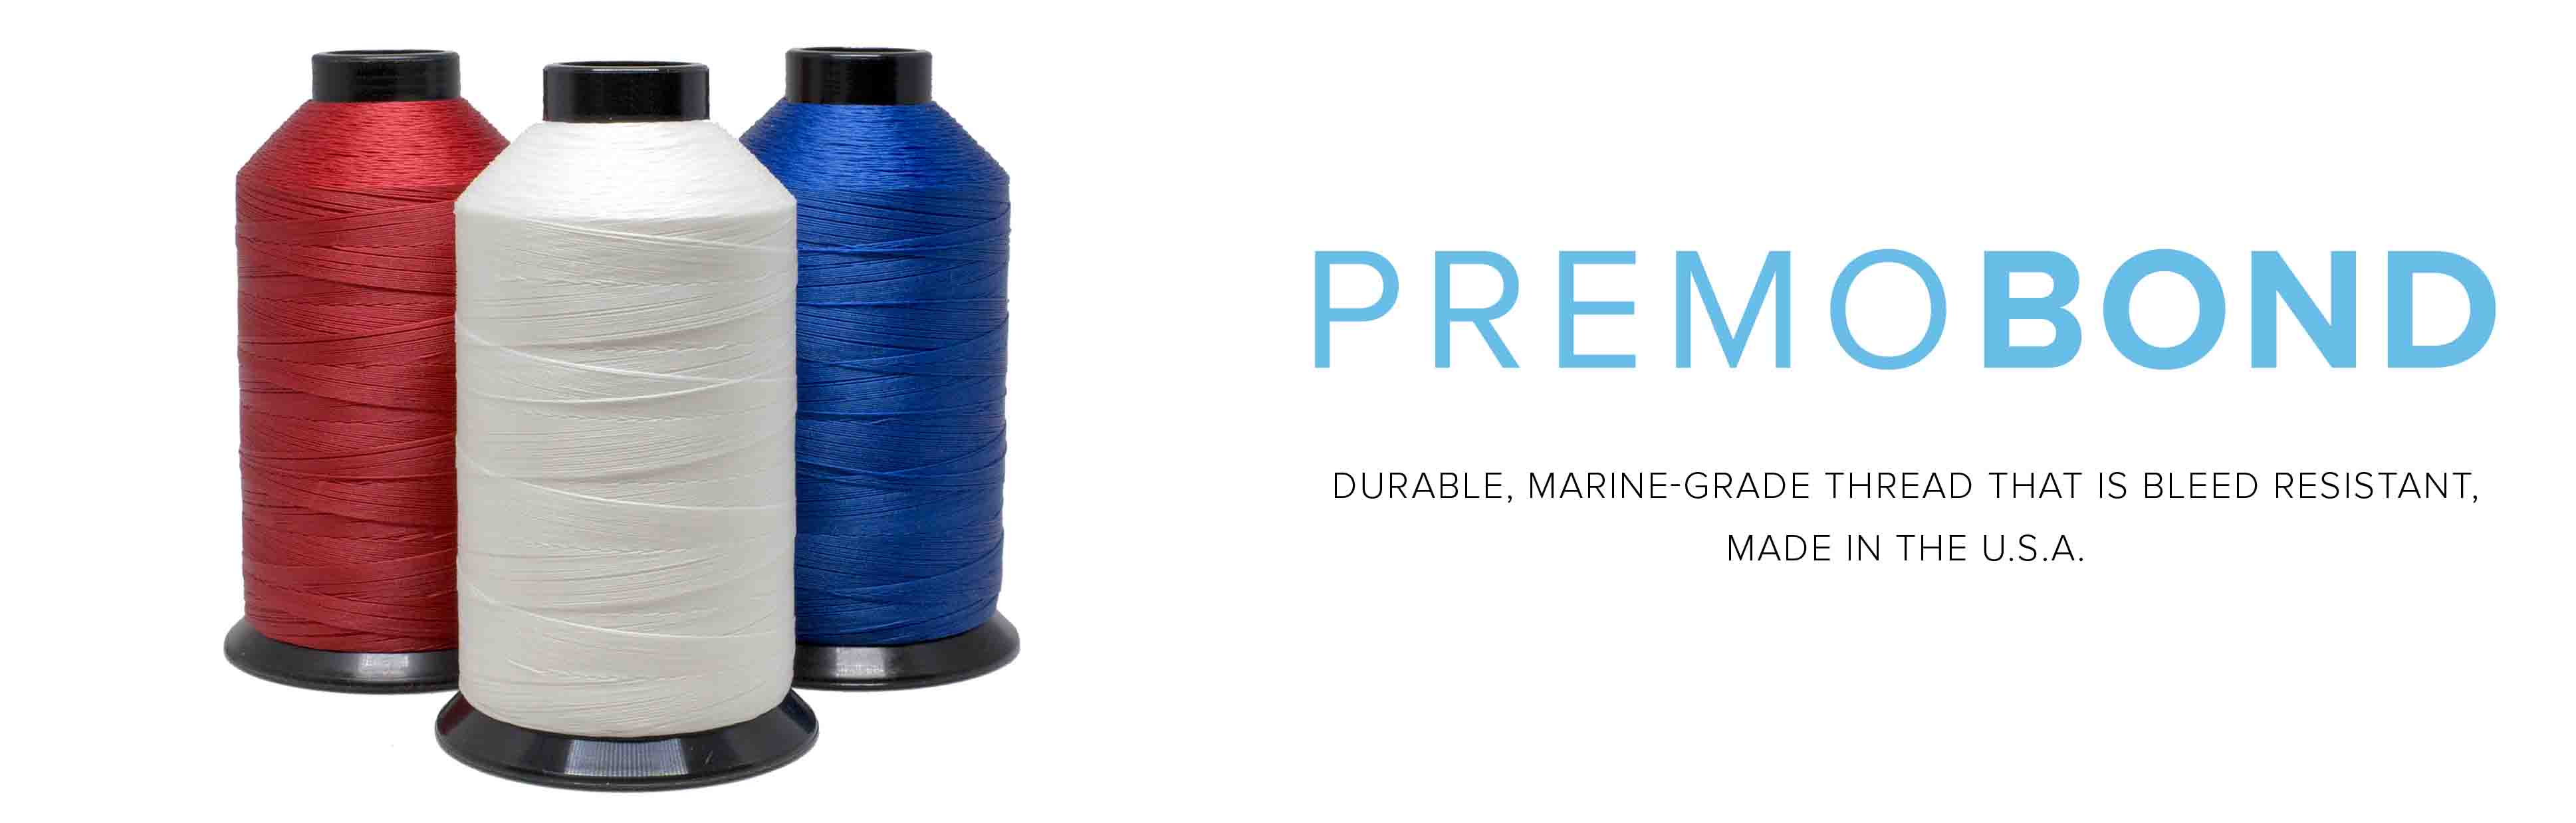 PremoBond thread advertisement